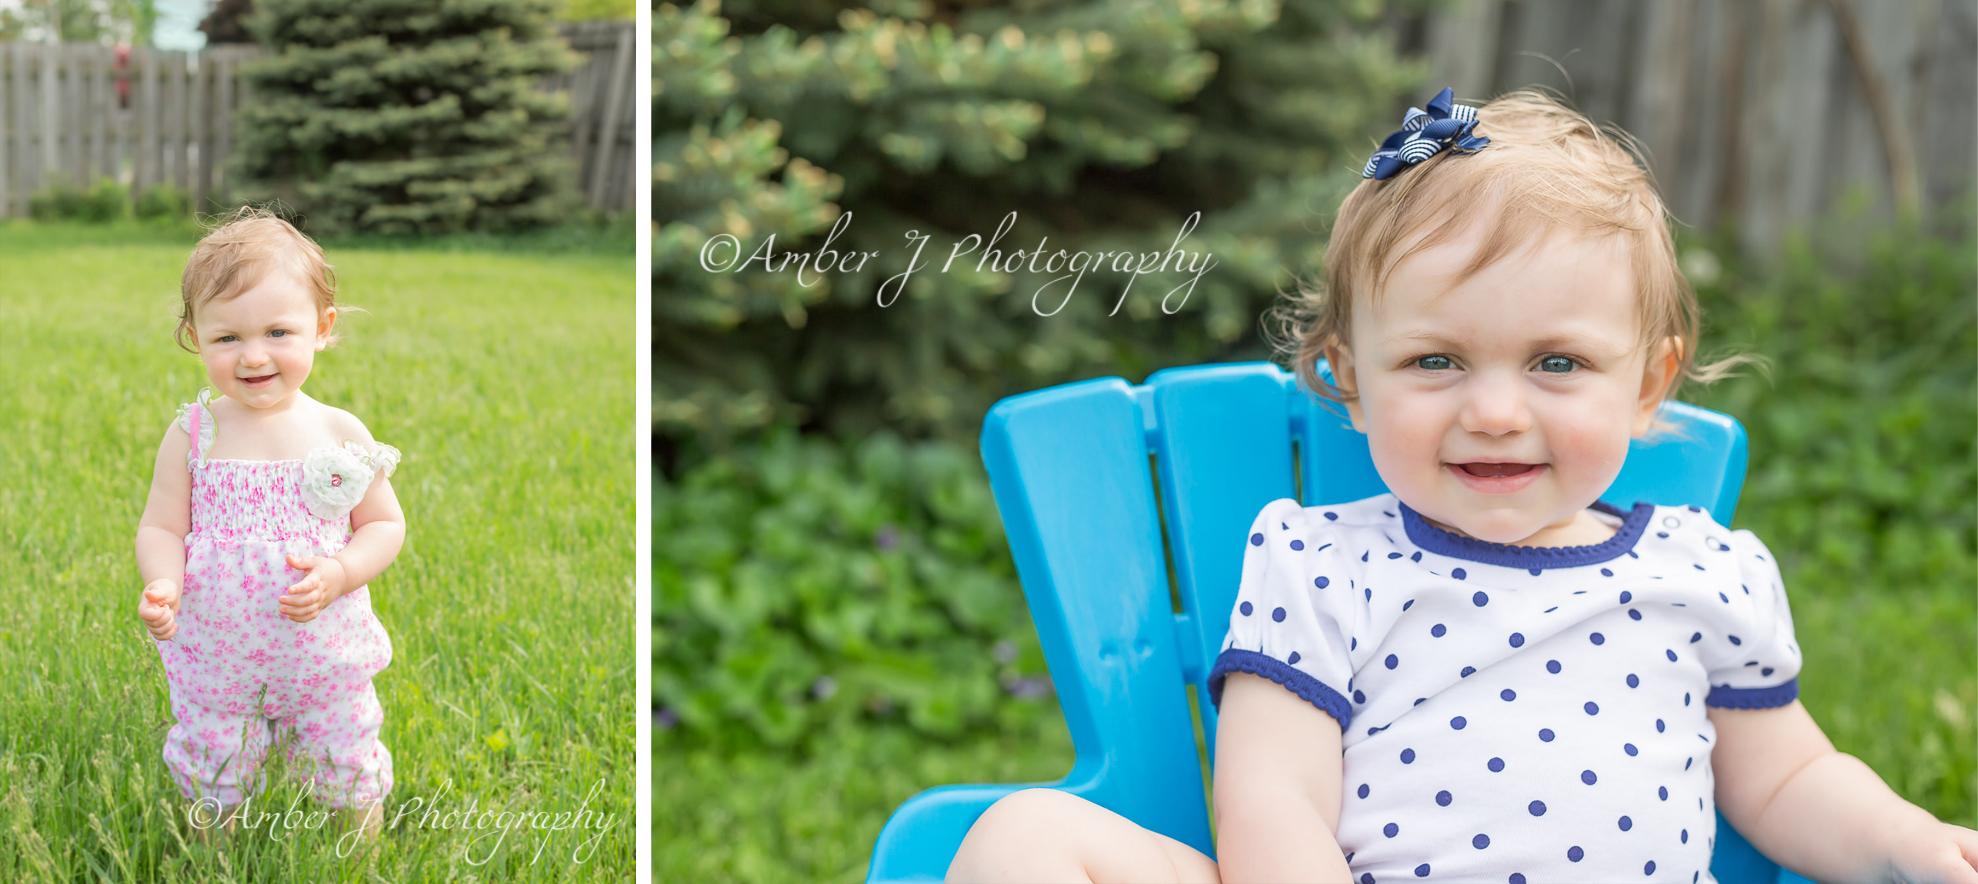 Jocelyn1year_amberjphotography_blog_01collage.jpg